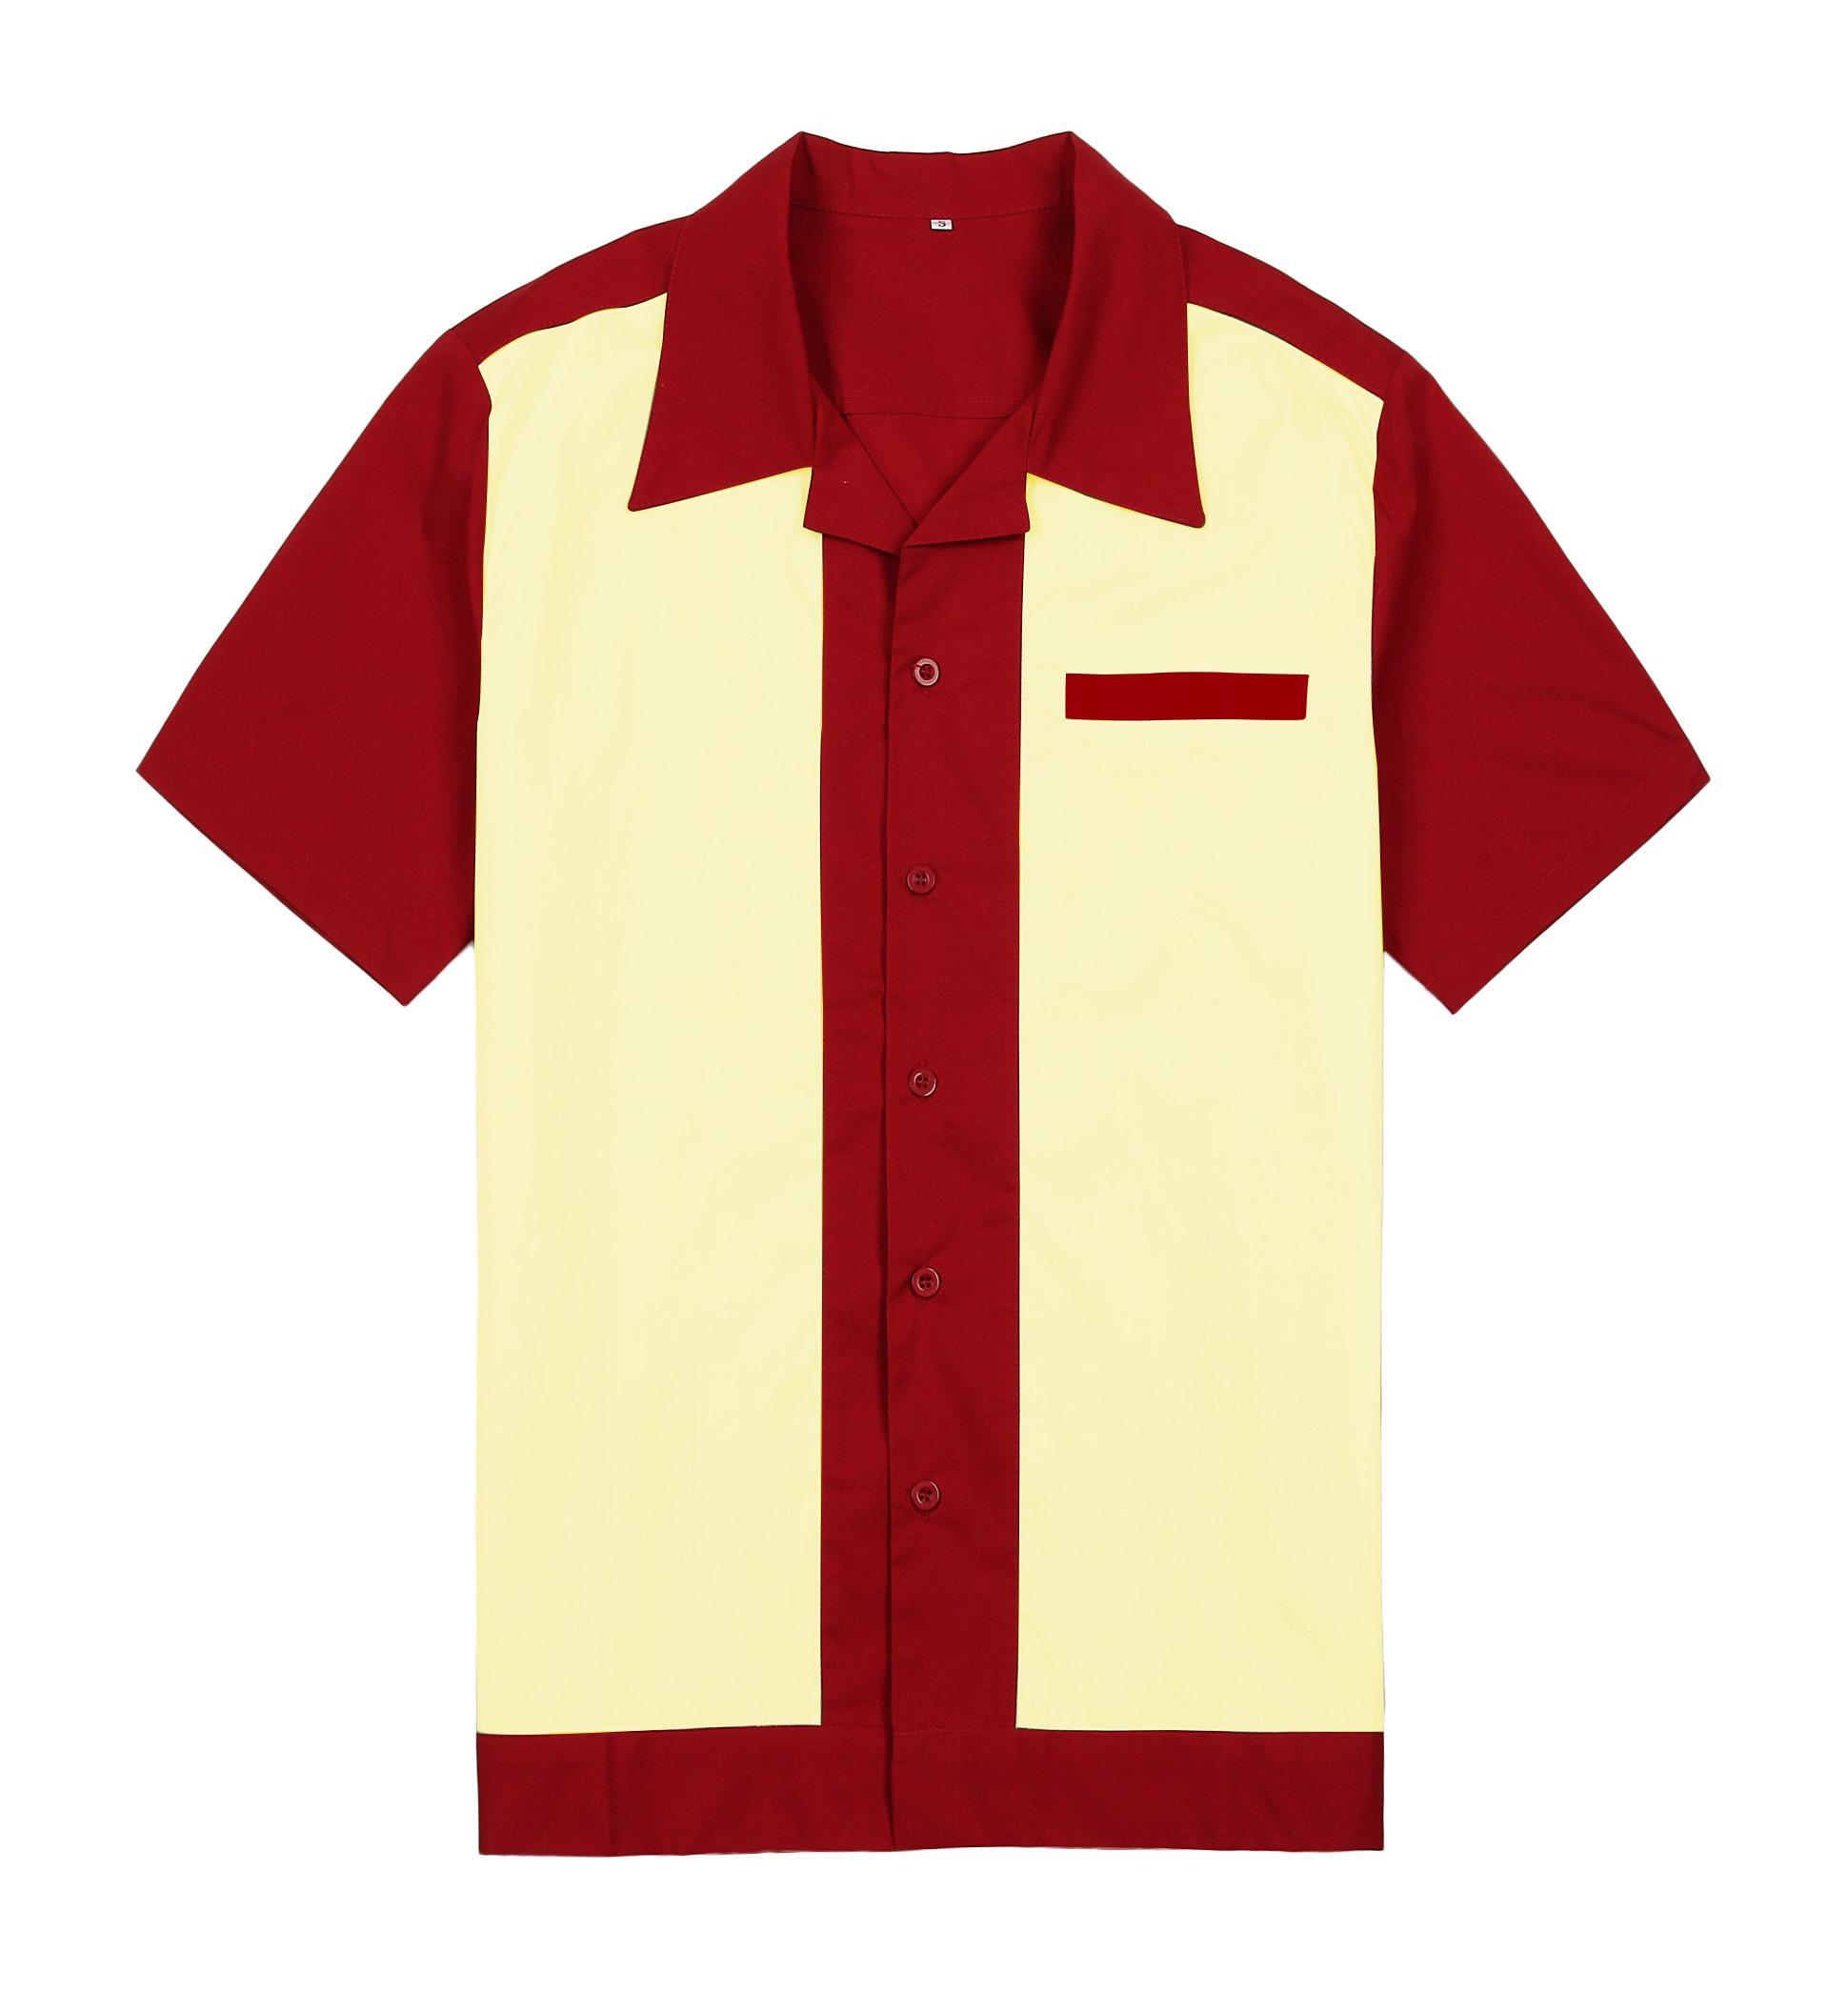 Wholesale- Mens Purple Wear 패널 색상 짧은 소매 단추, 남성용면 50 50 년대 빈티지 캐쥬얼 디자이너 셔츠 무료 배송